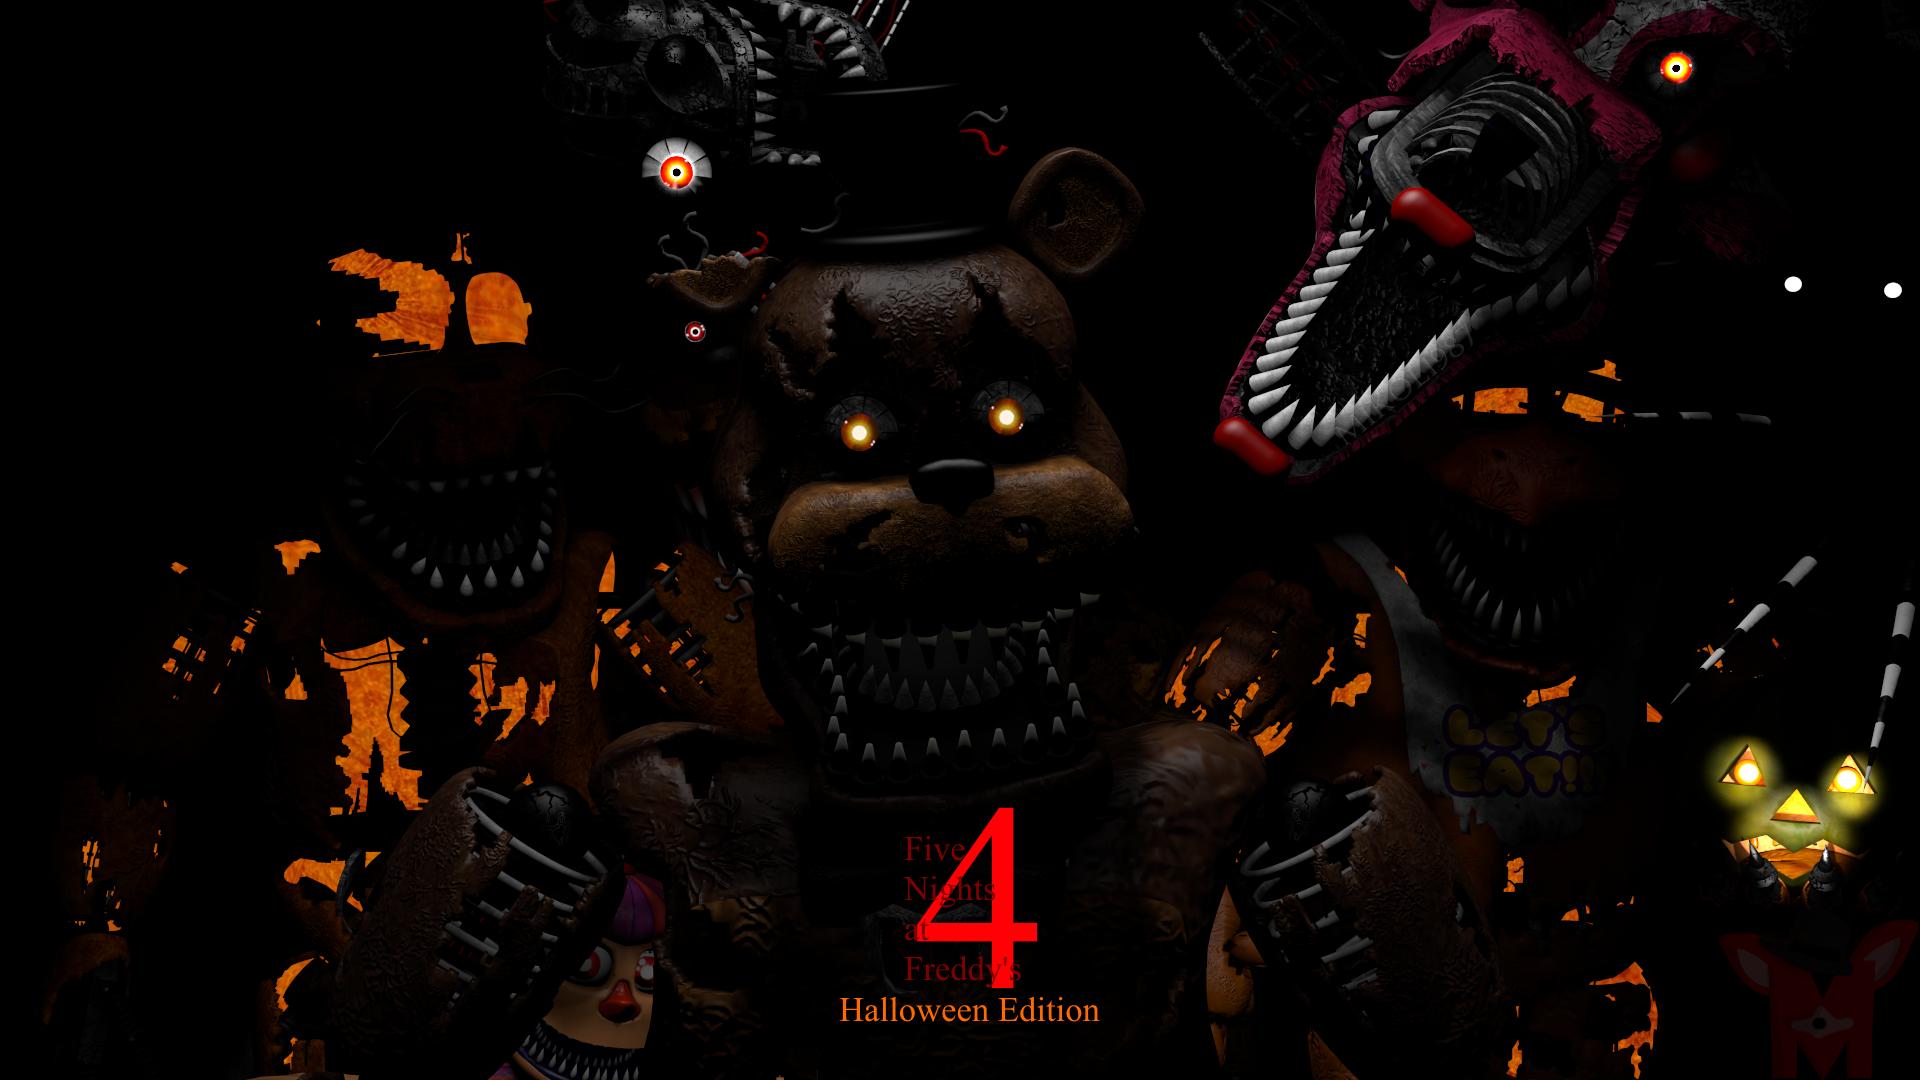 FNaF SFM: Five Nights At Freddy's 4 Halloween by Mikol1987 on ...